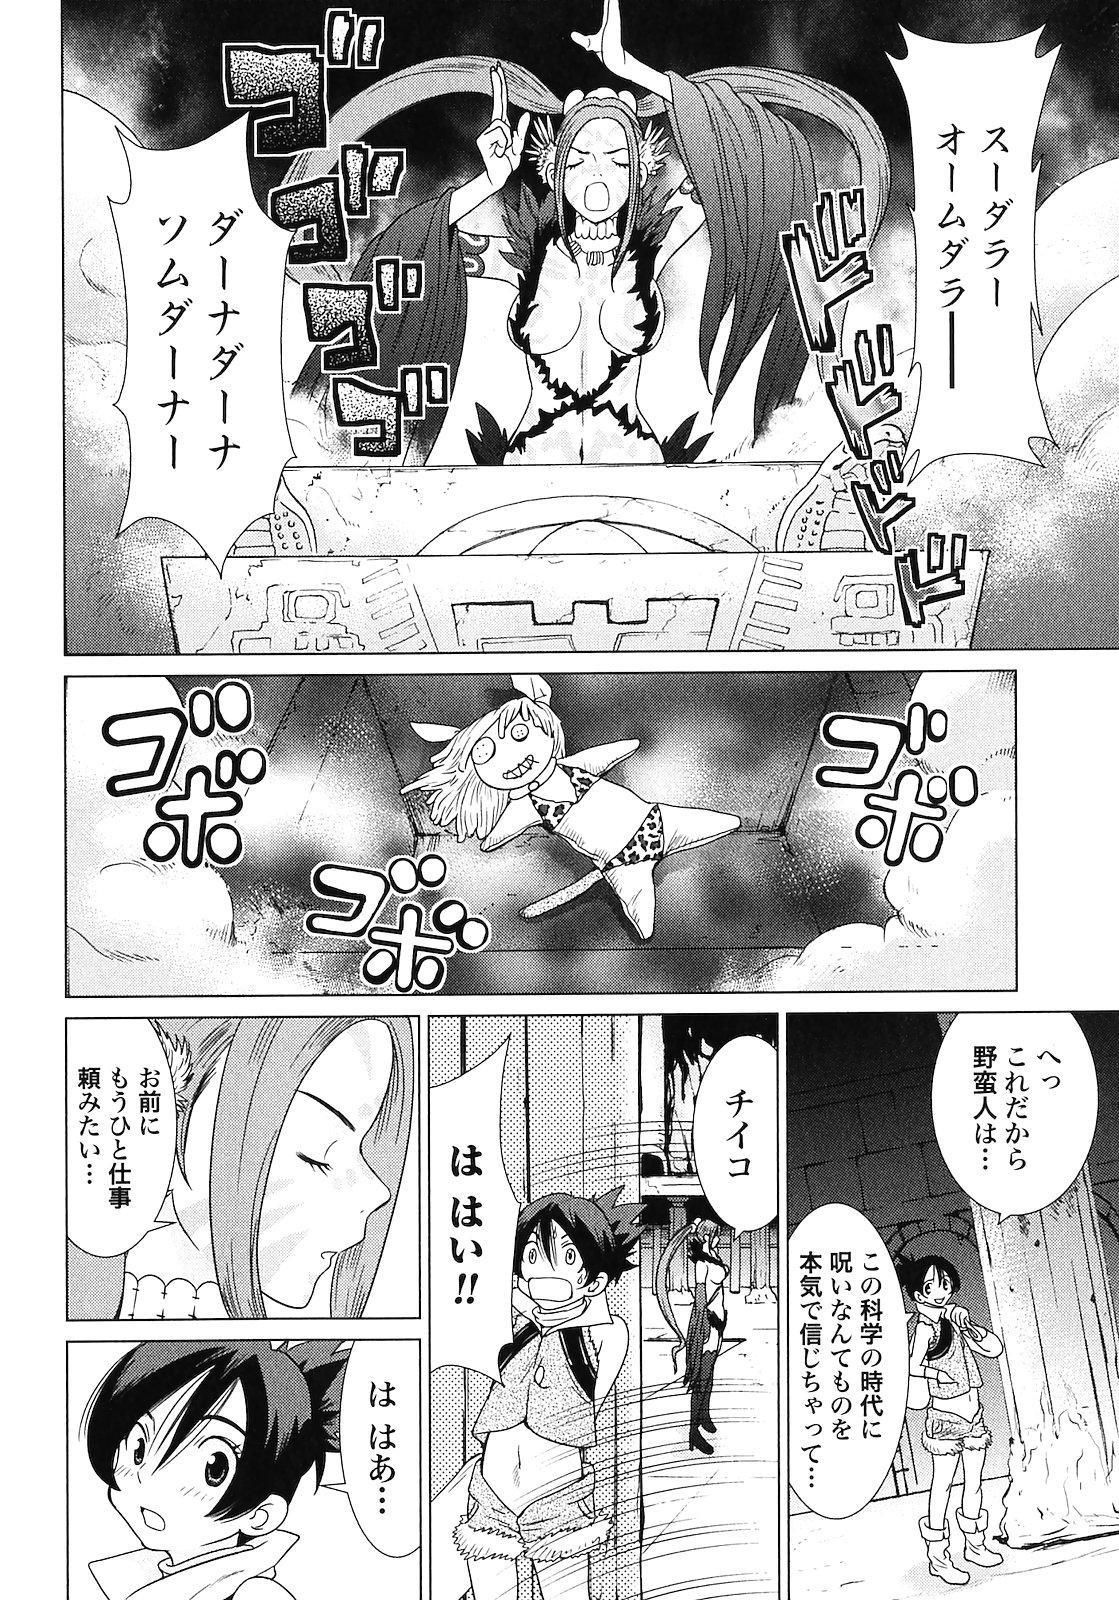 Makyo no Shanana Vol.02 35